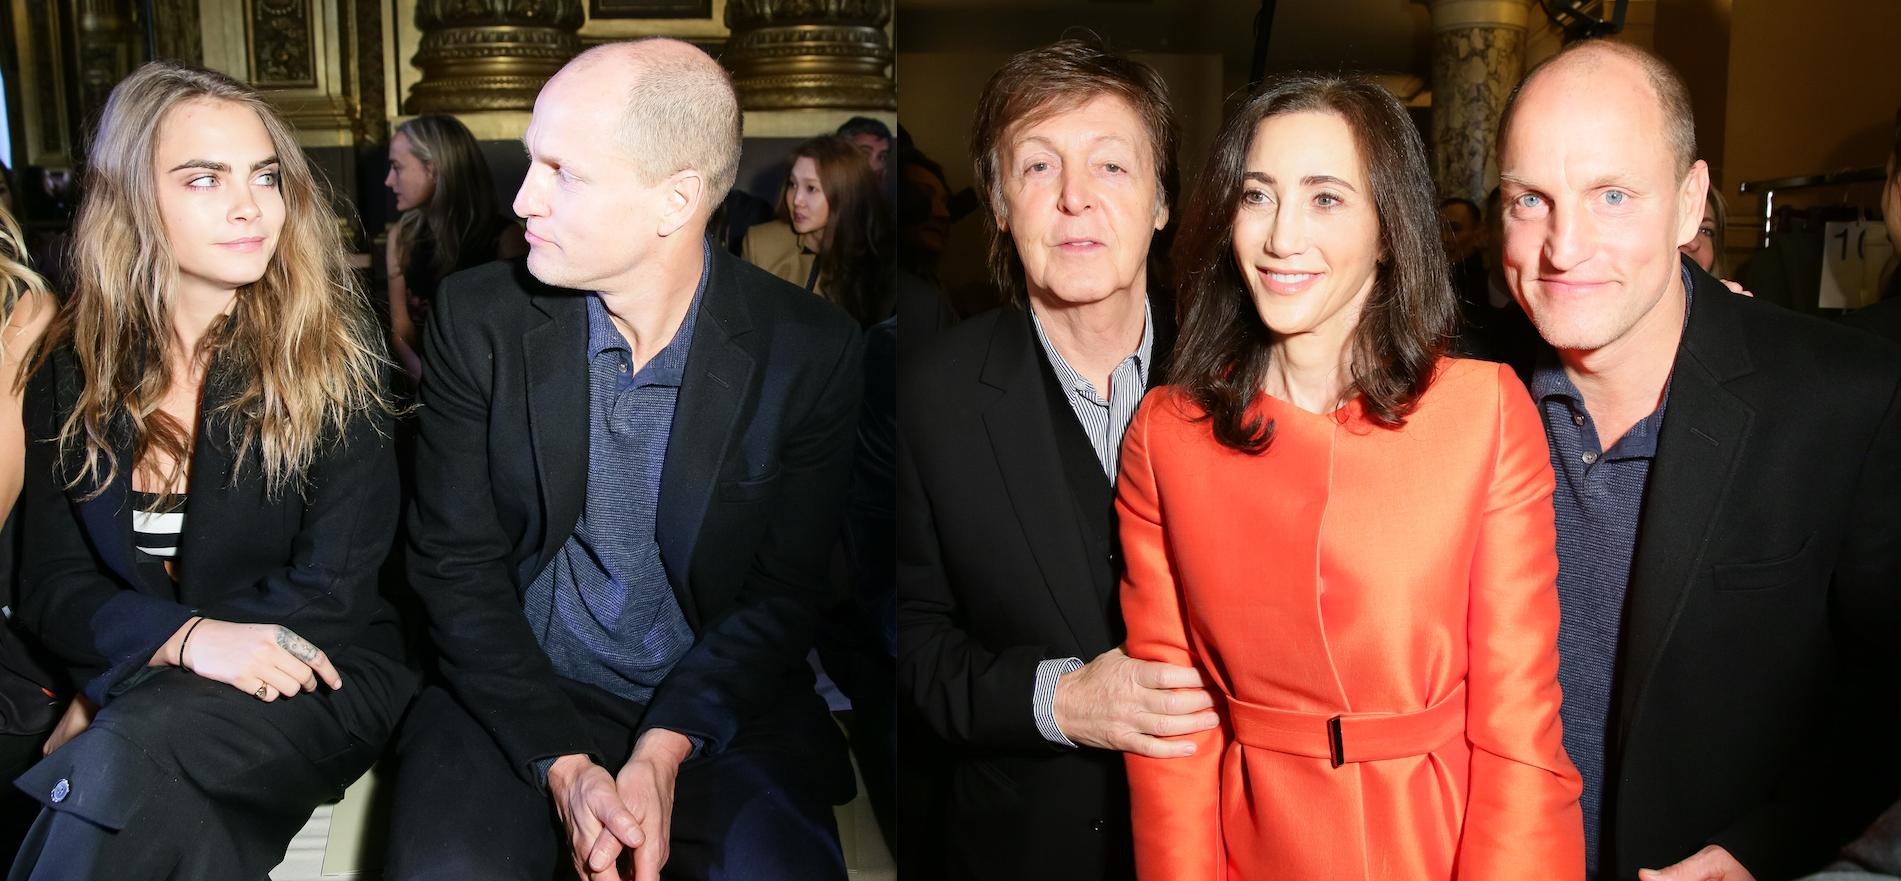 Cara Delevingne and Woody Harrelson; Paul McCartney, Nancy Shevell and Mr. Harrelson (Photos: BFA).